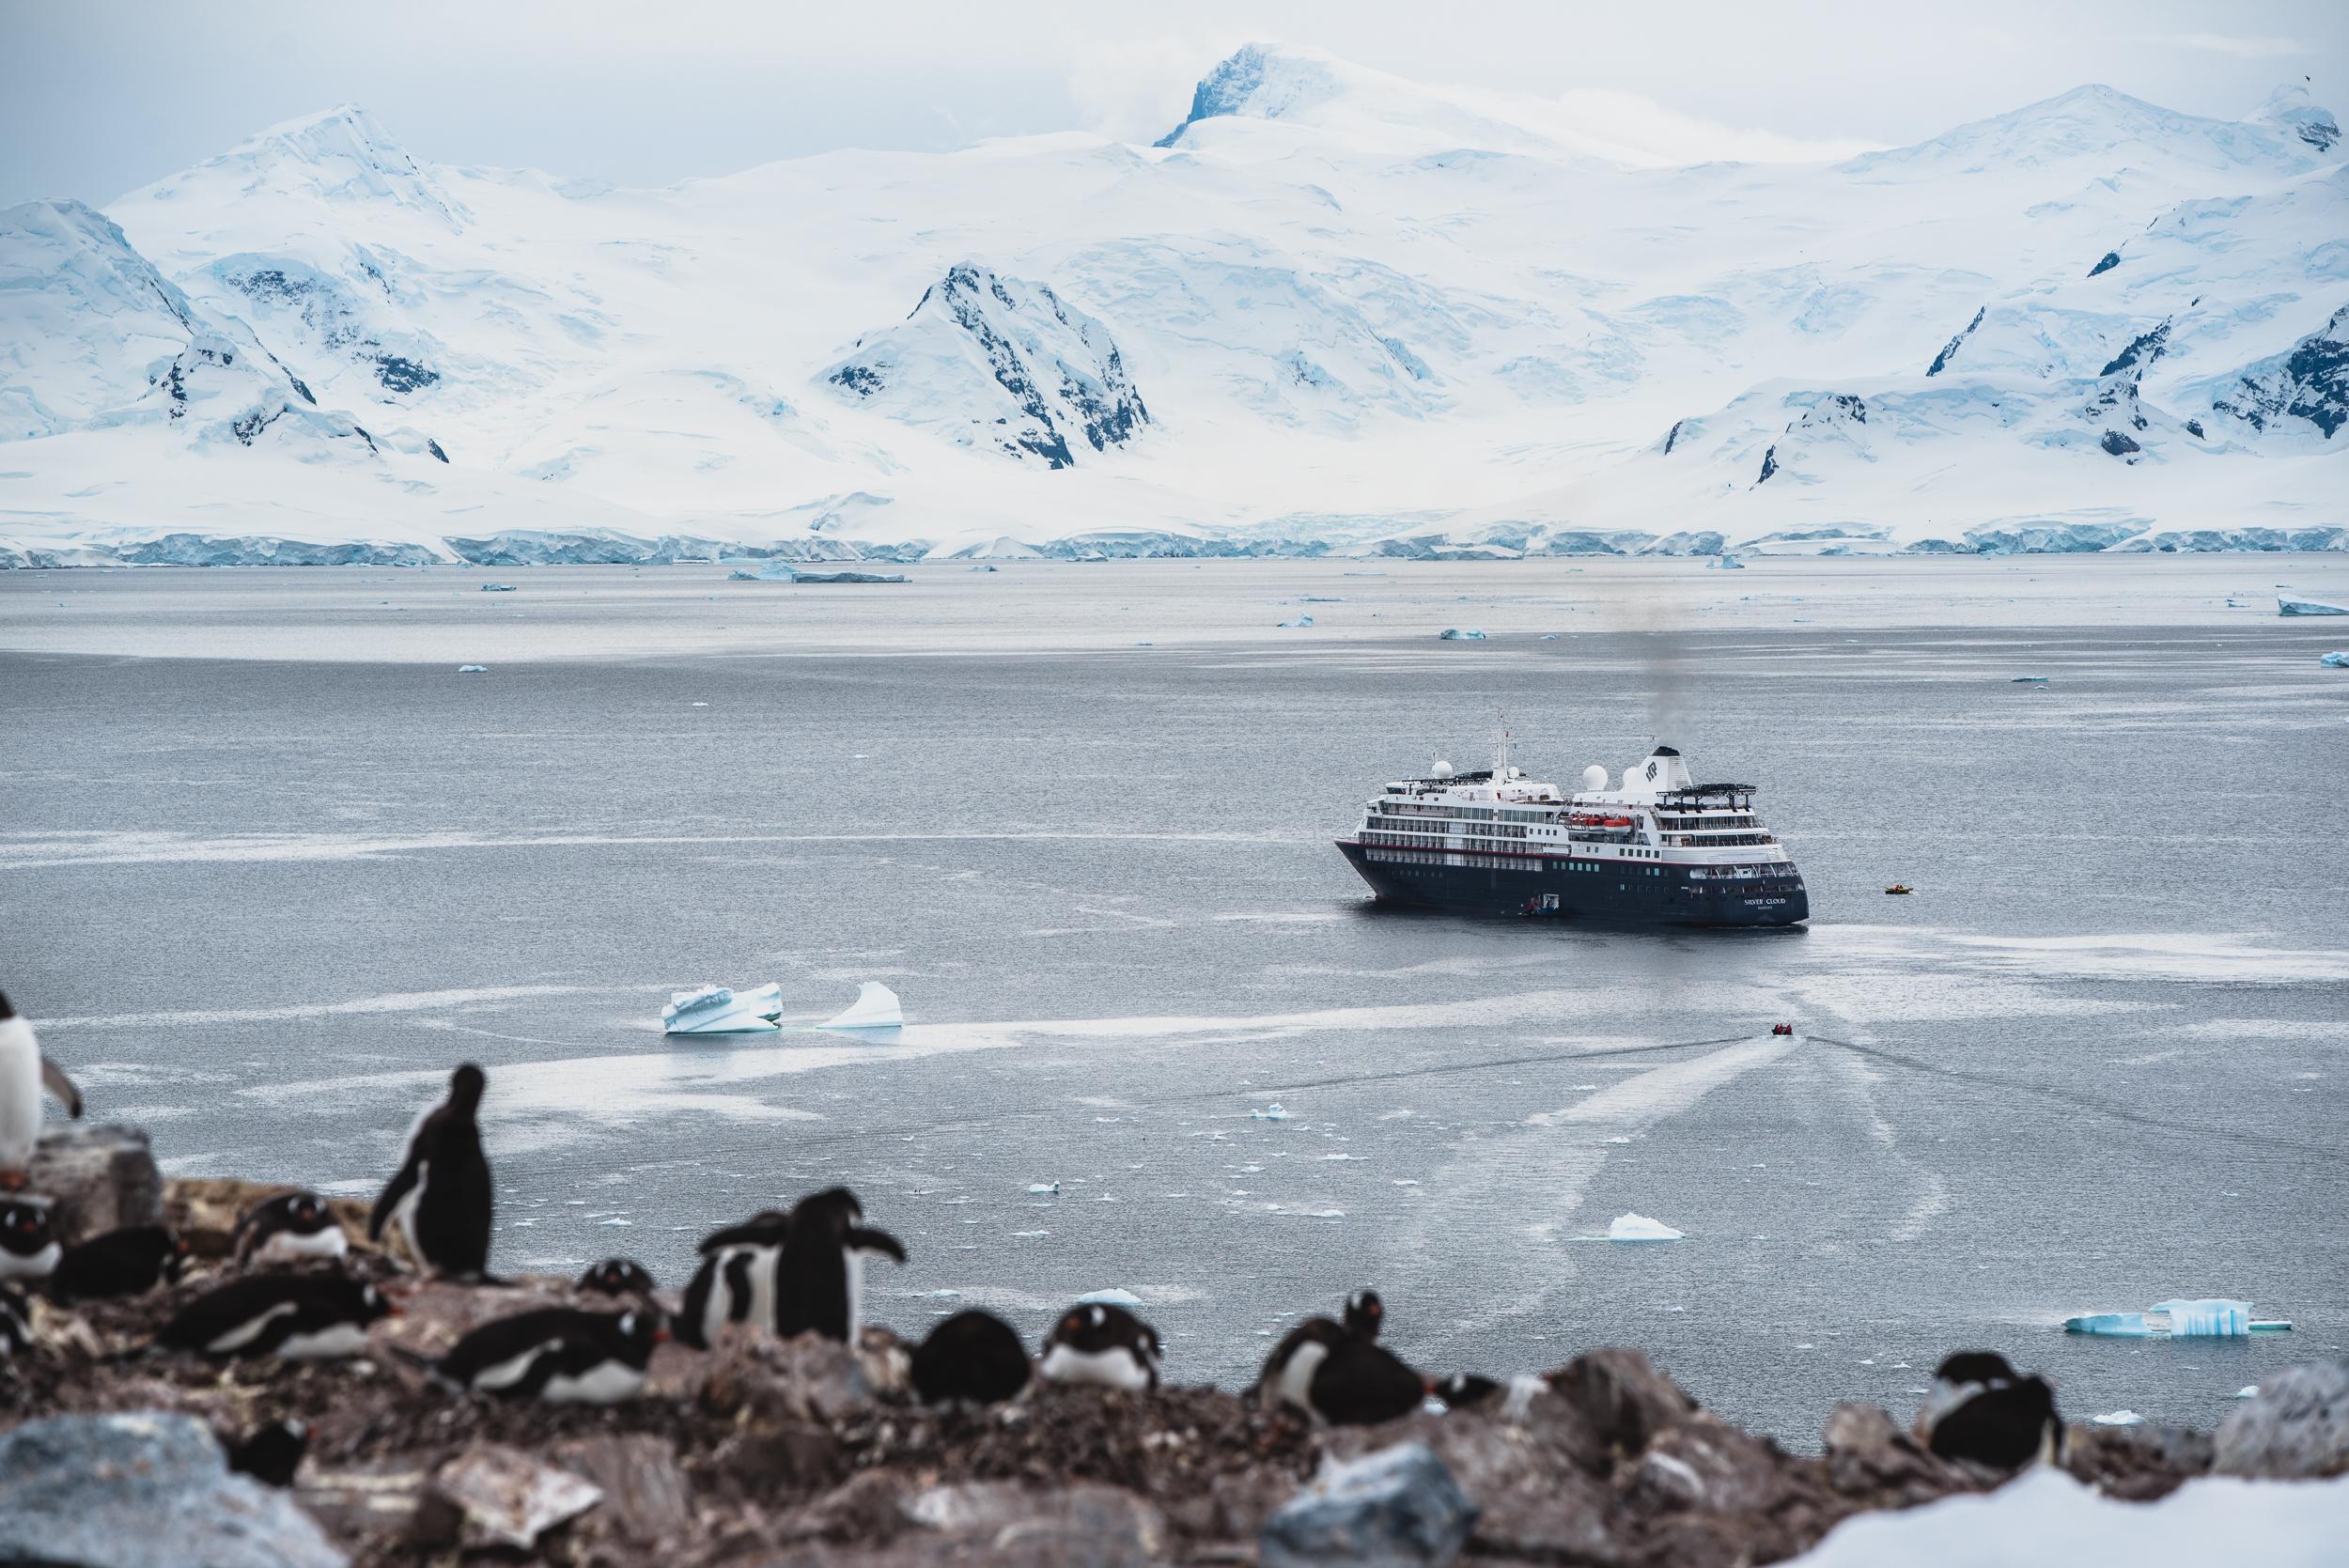 joe-thomas-photo-antarctica-travel-new-york-photographer-17.jpg